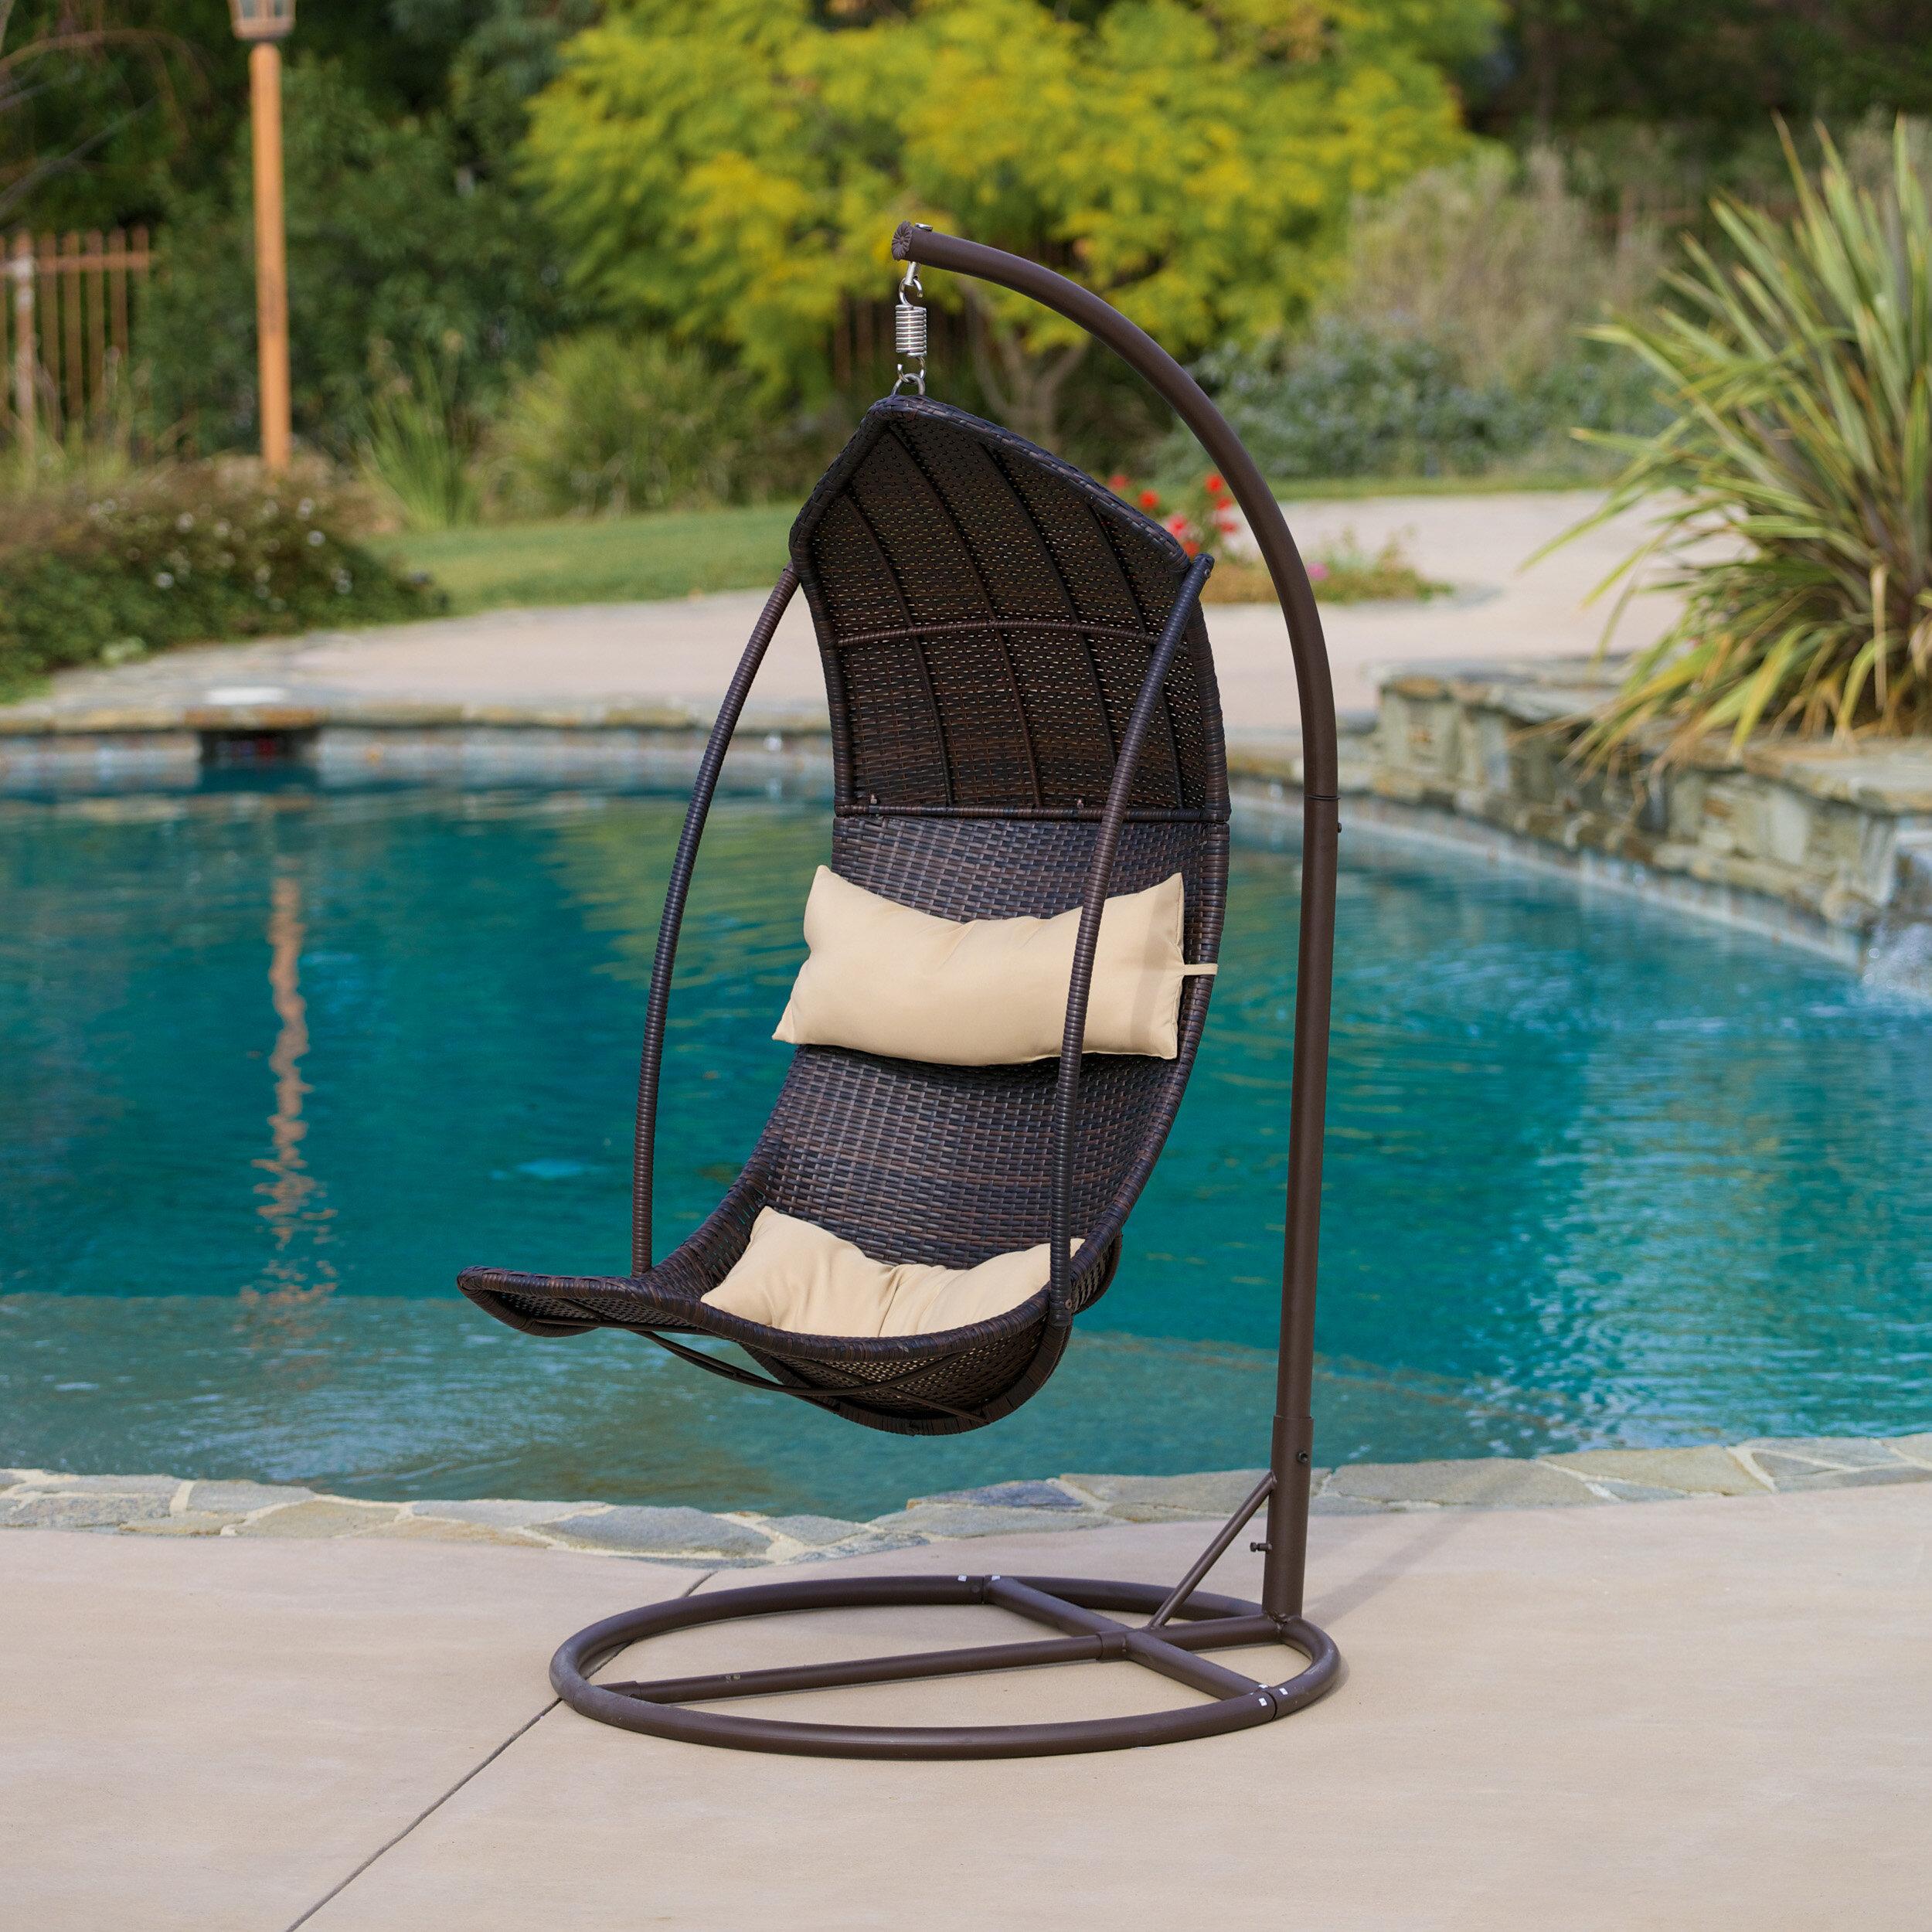 luxury child hammock slide green for chair beautiful kids walmart of com swing home n insight